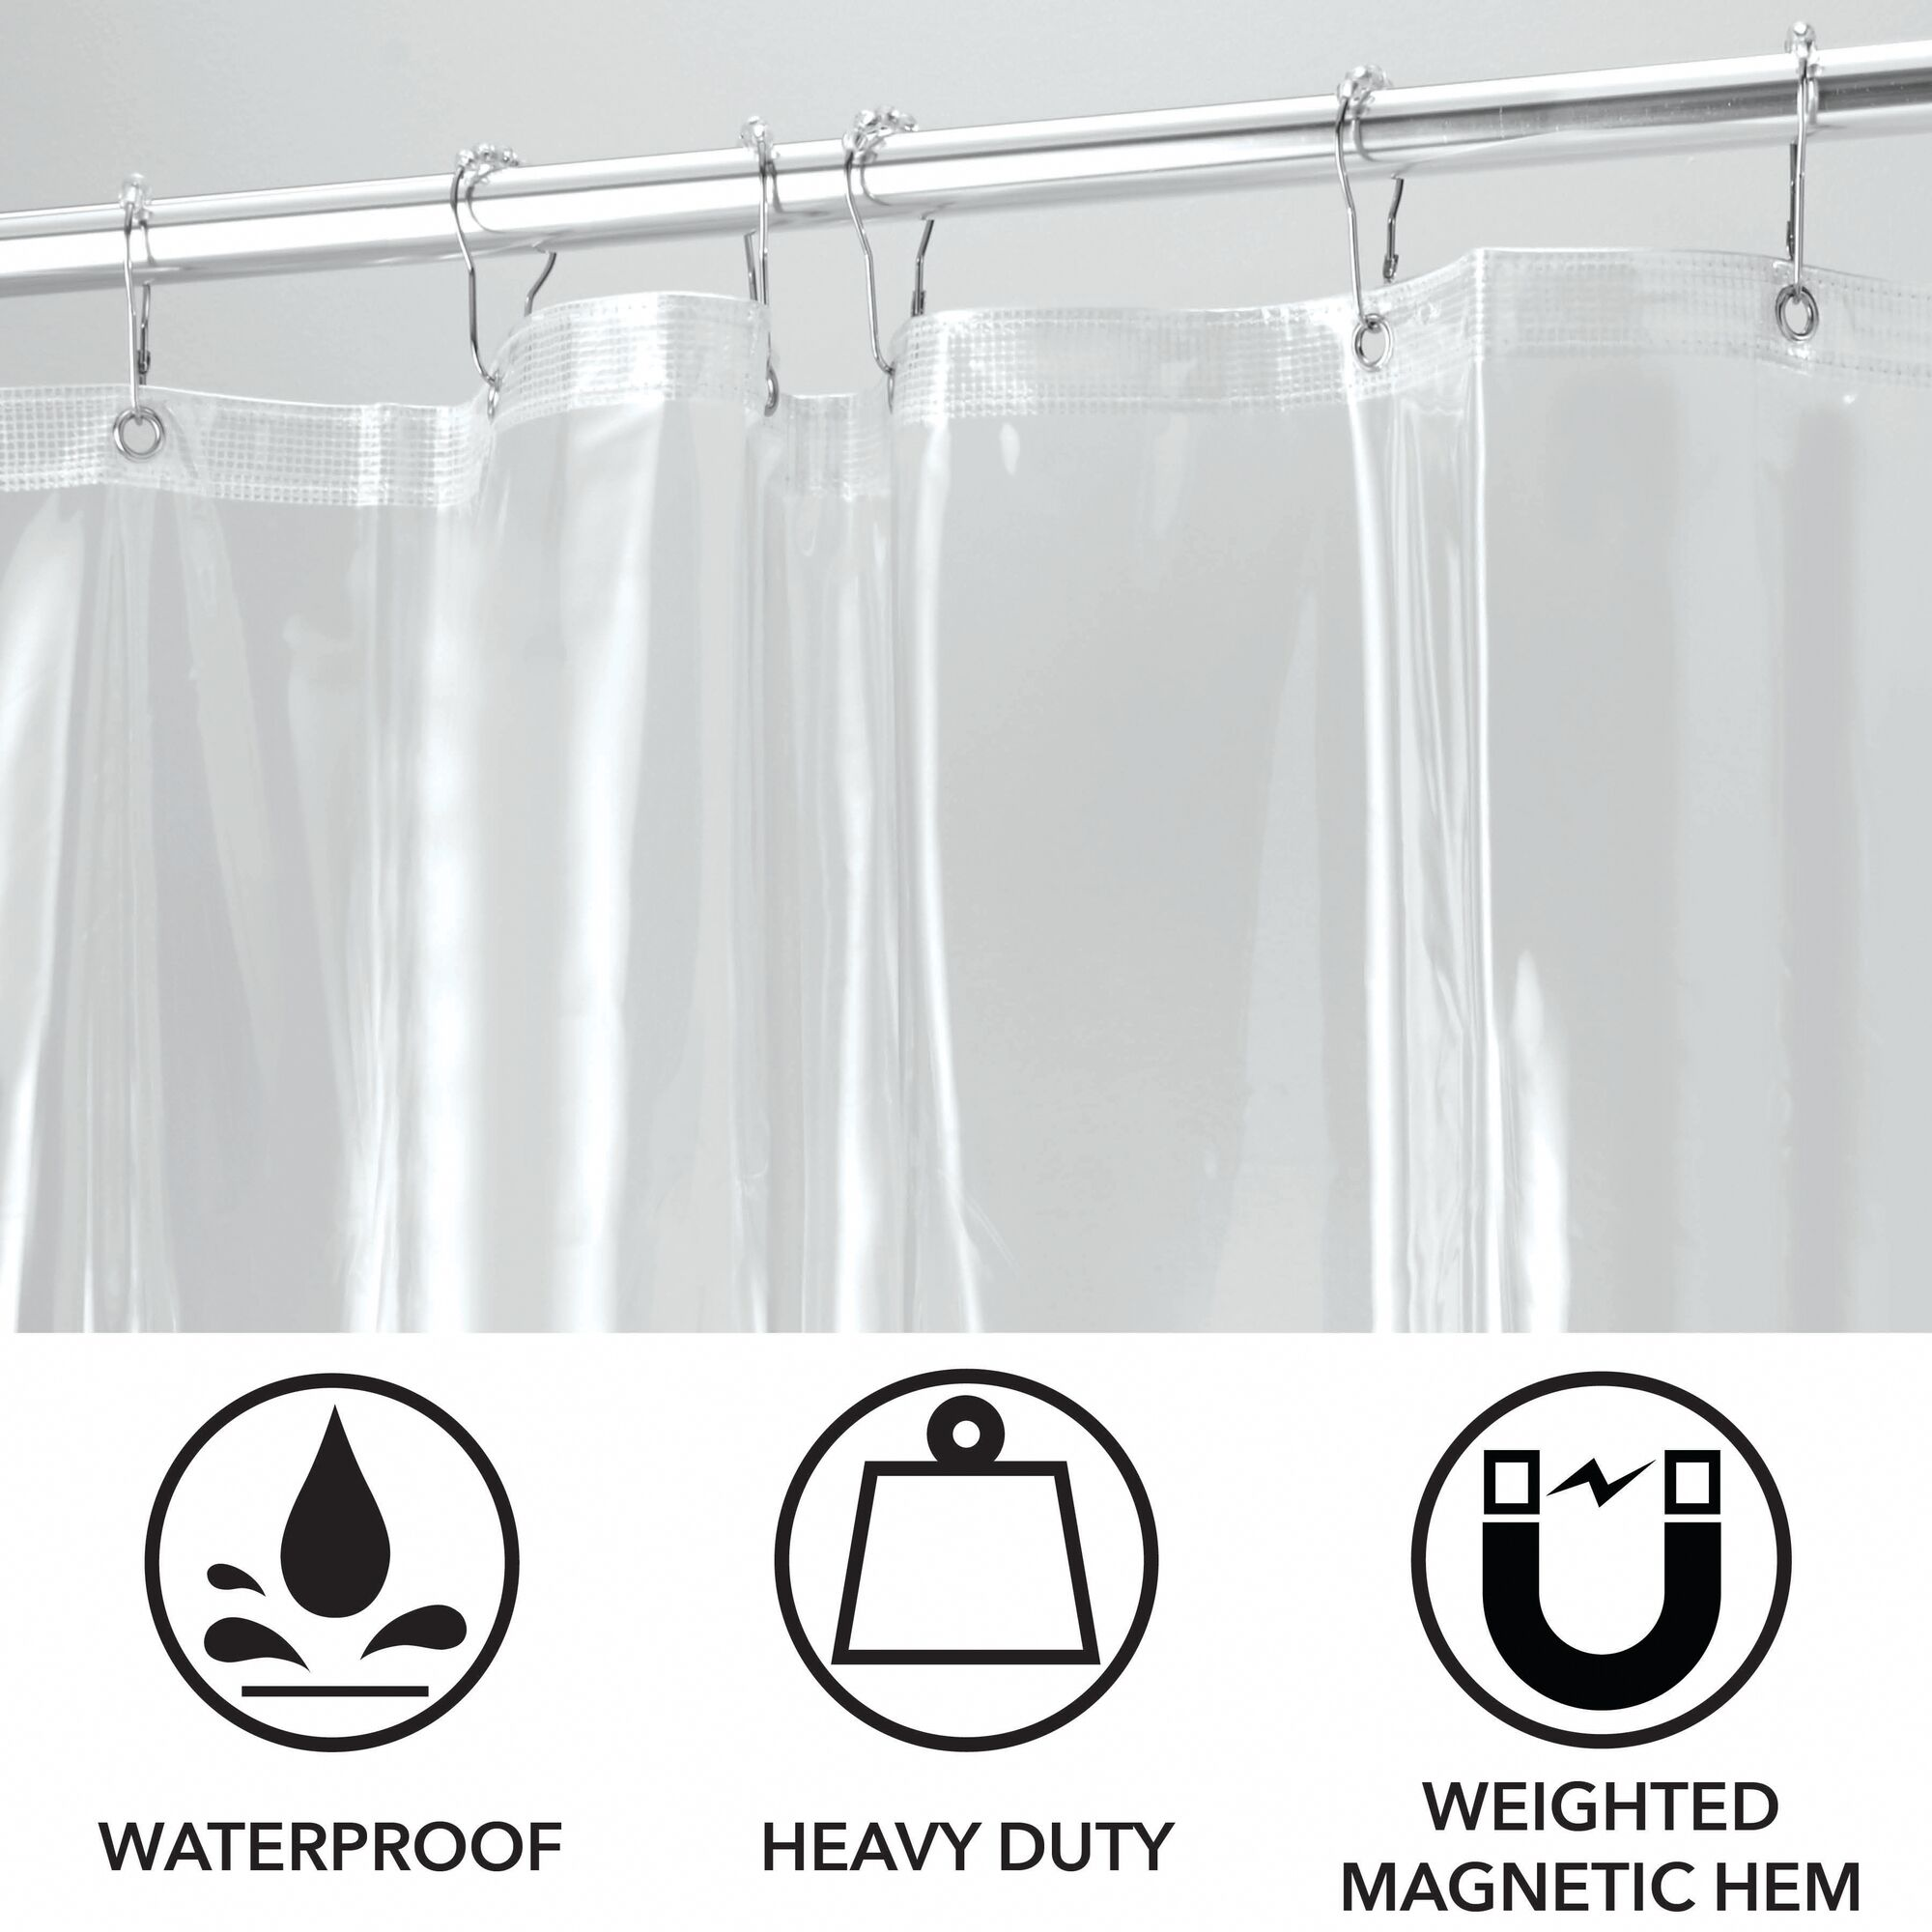 mDesign-Premium-Waterproof-Vinyl-Shower-Curtain-Liner-72-034-x-72-034 miniatuur 21